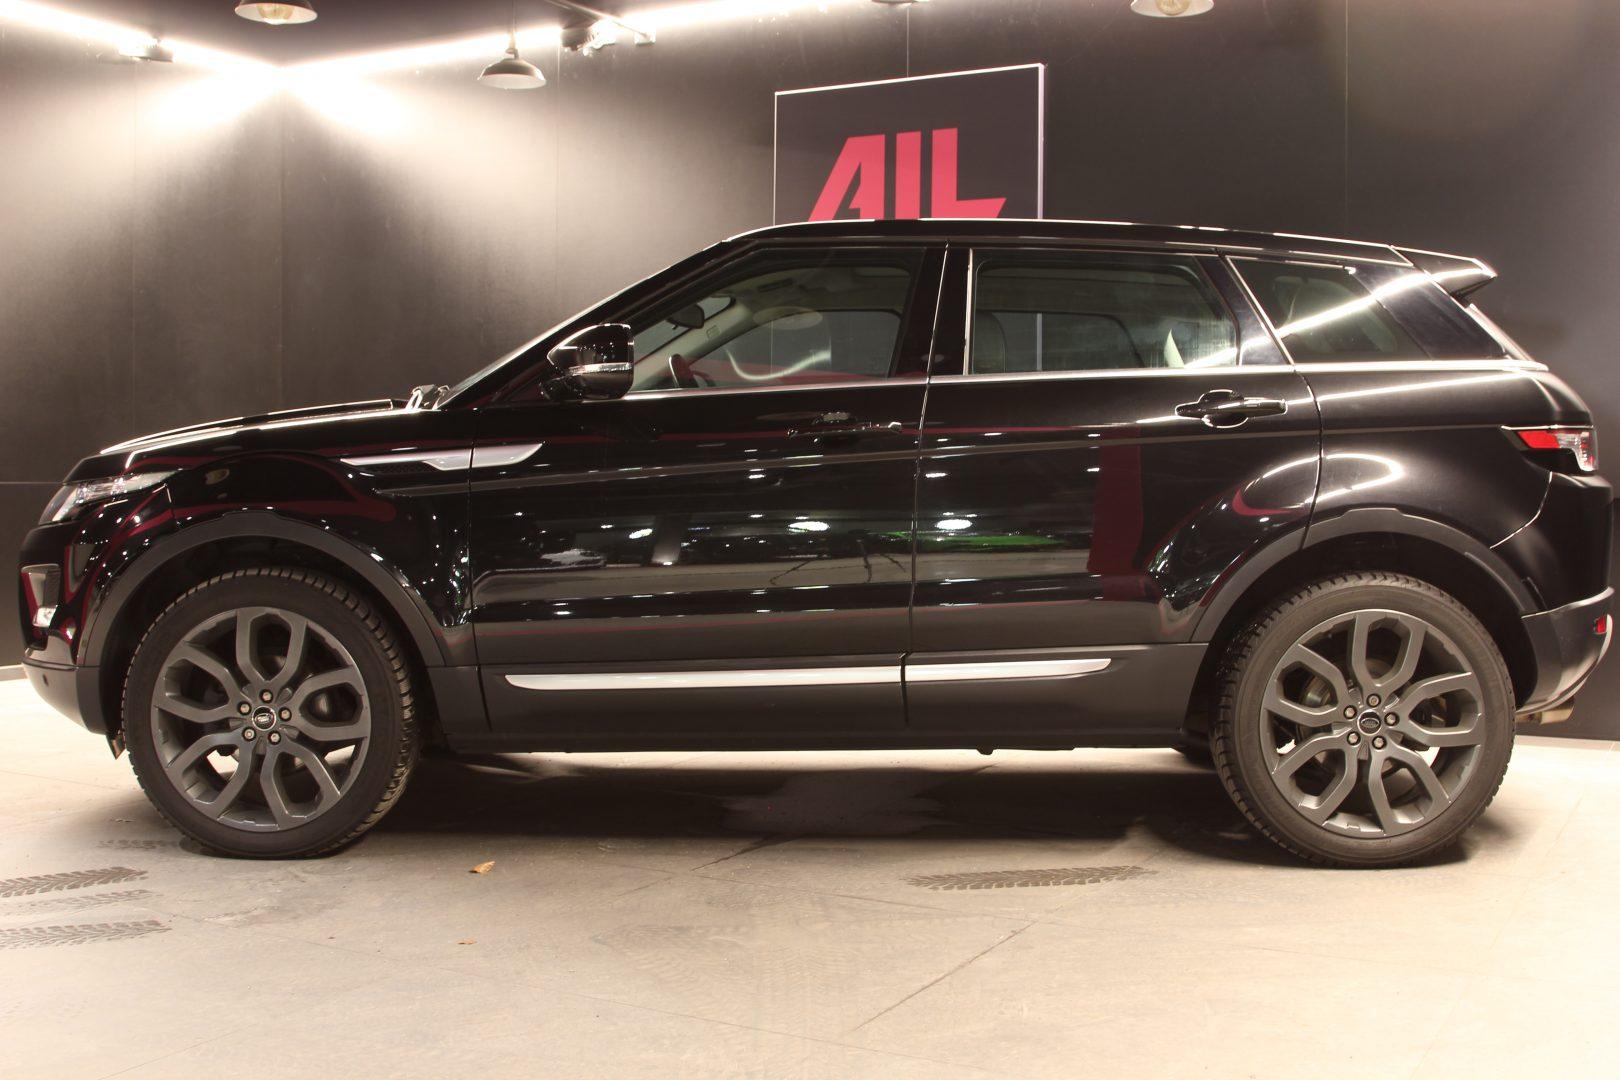 AIL Land Rover Range Rover Evoque Prestige 3